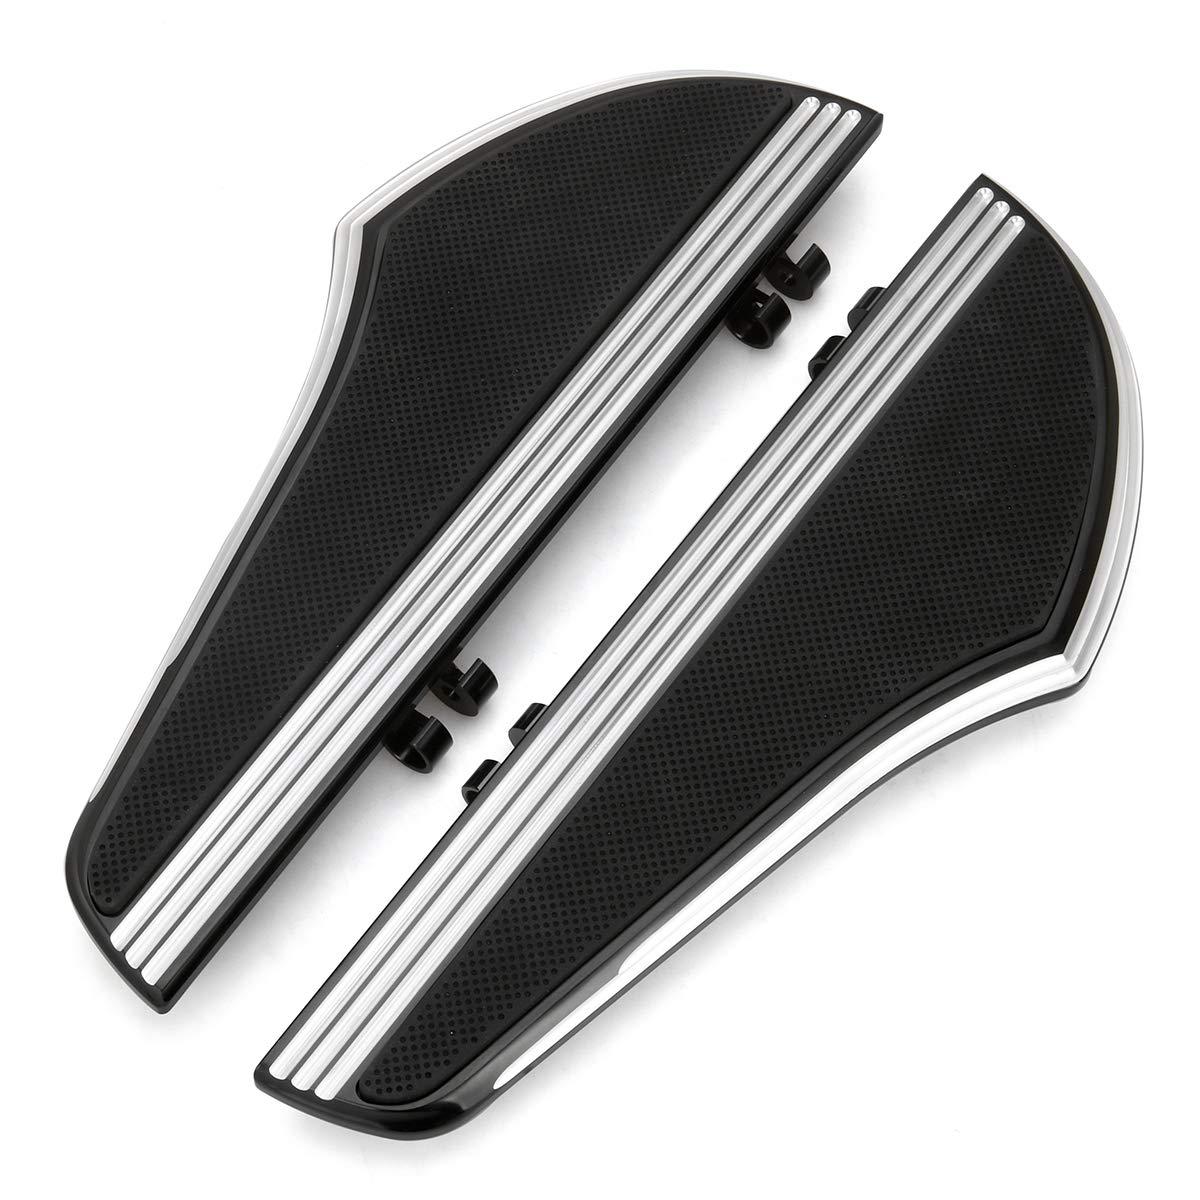 Defiance Brake Pedal Pad For Harley Davidson Electra Glide FLHT Heritage Softail